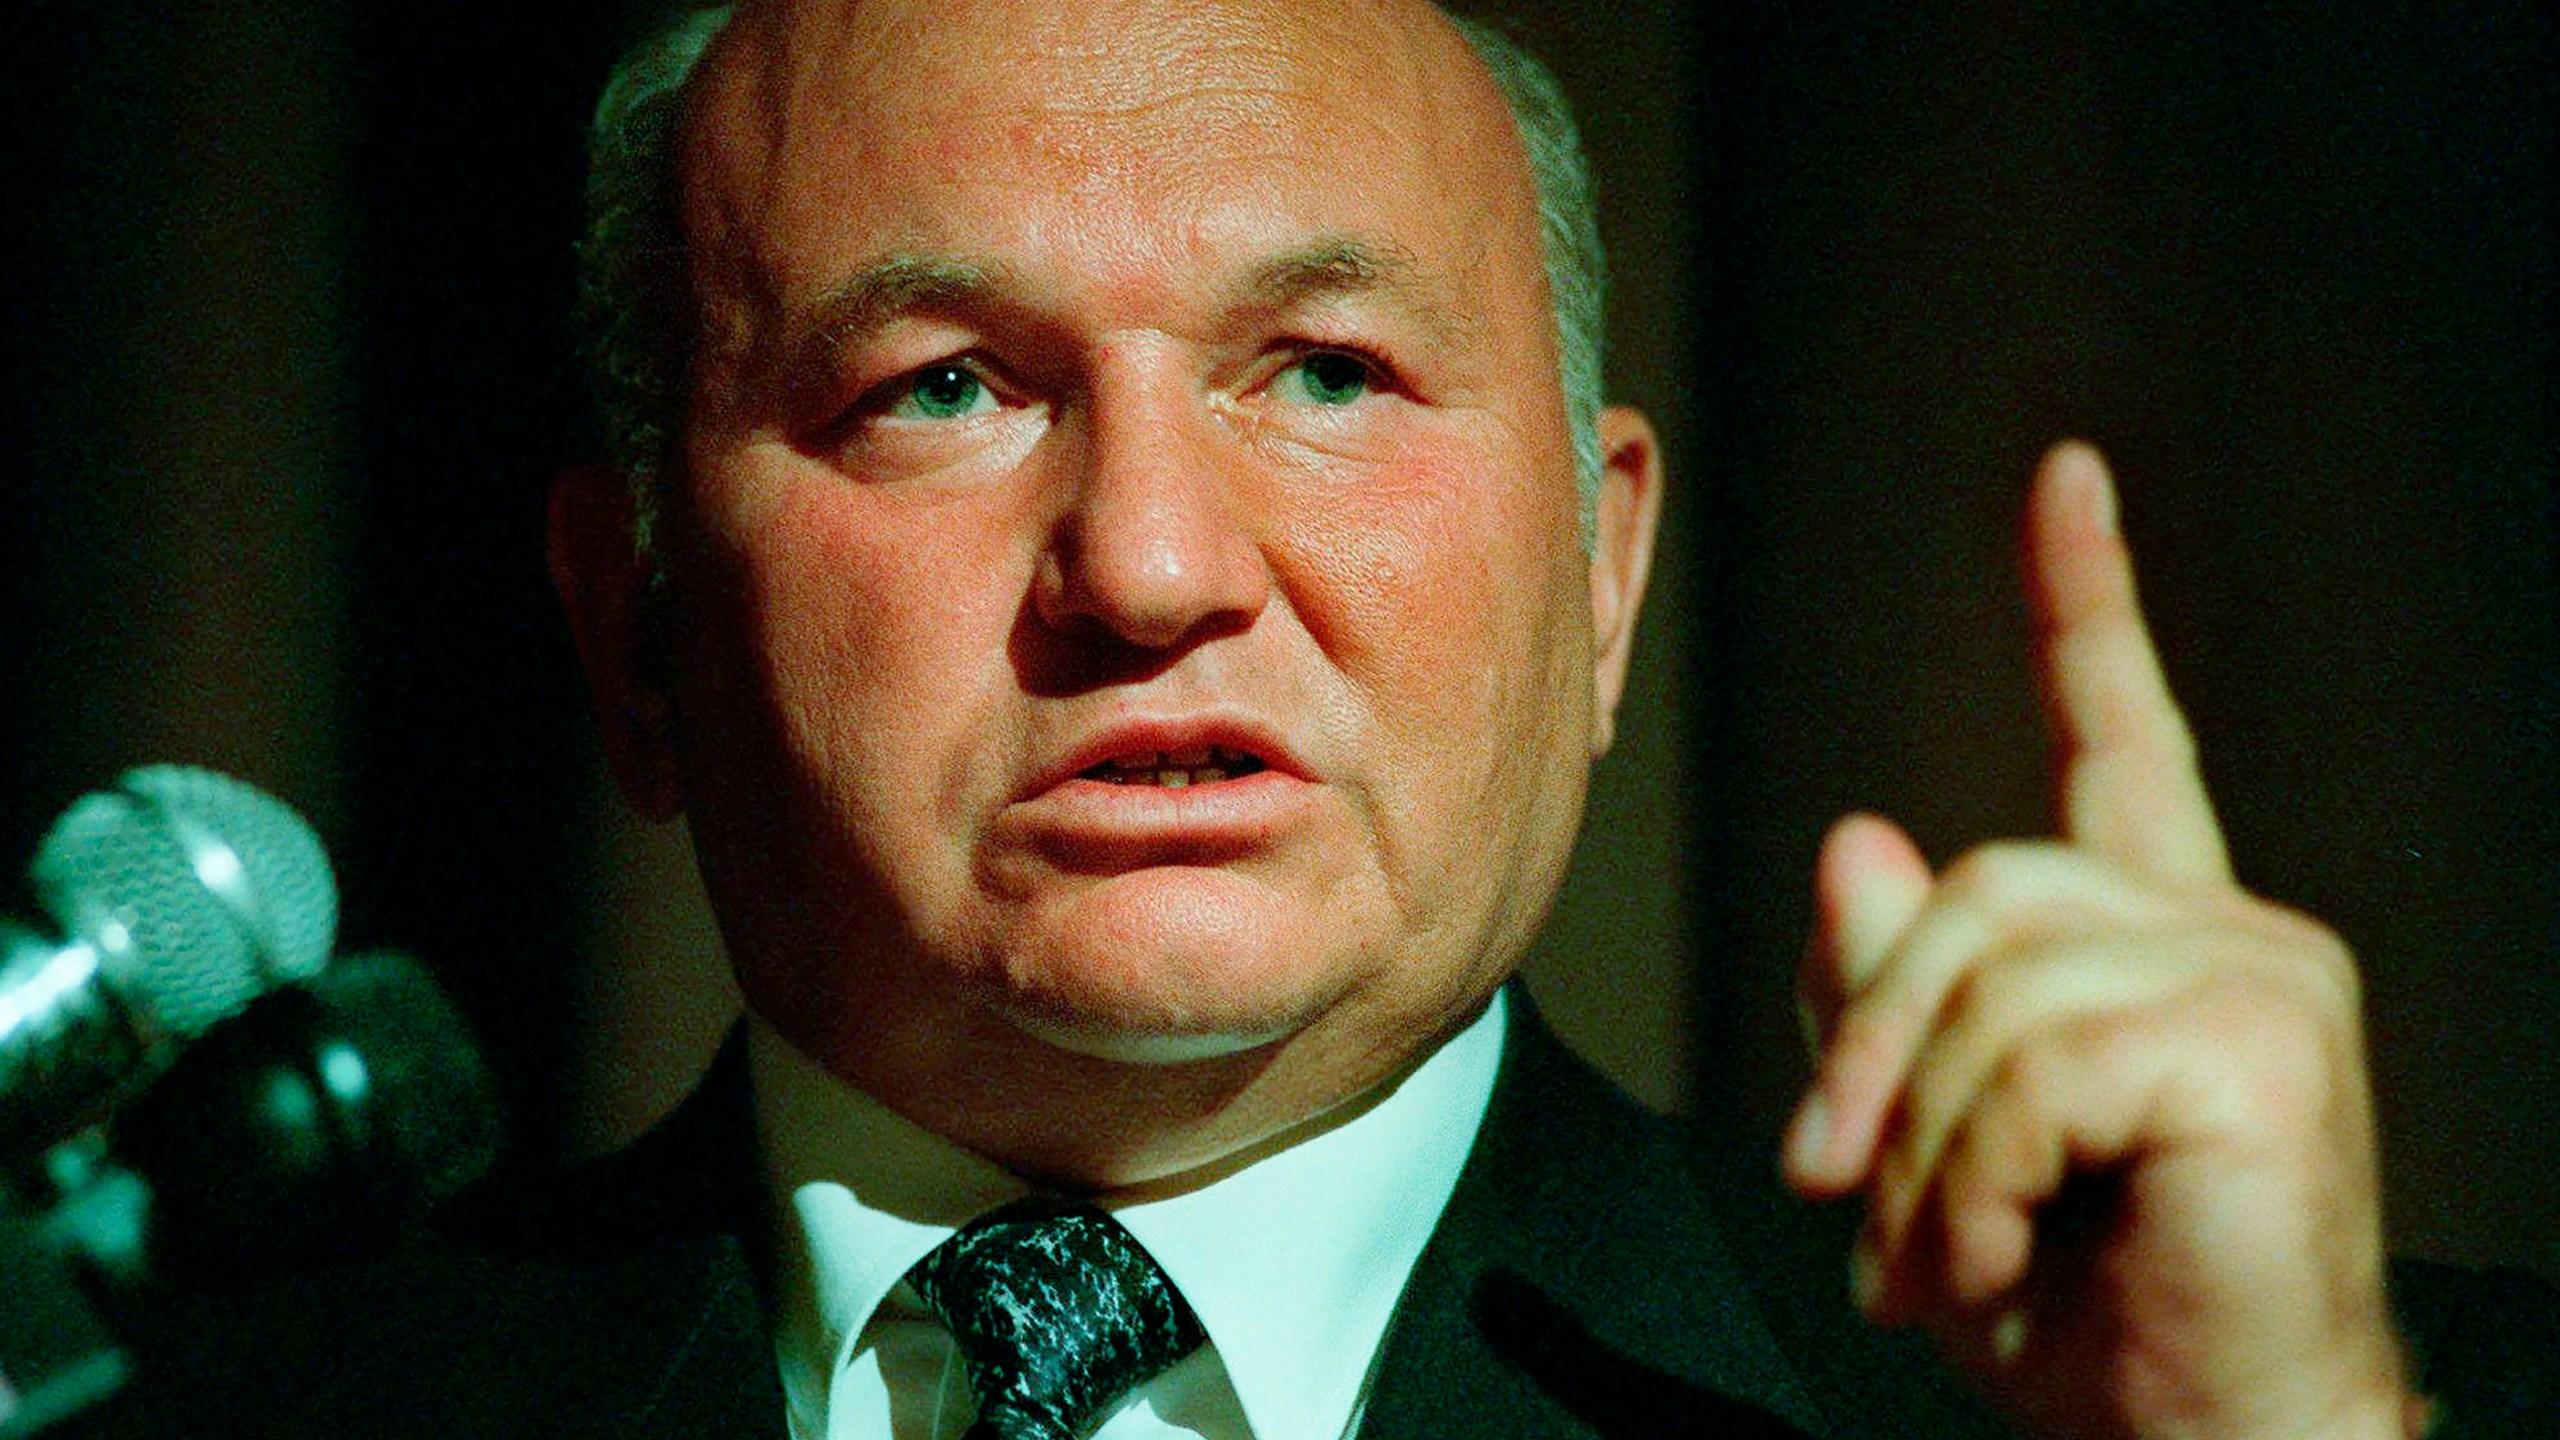 Yuri Luzhkov